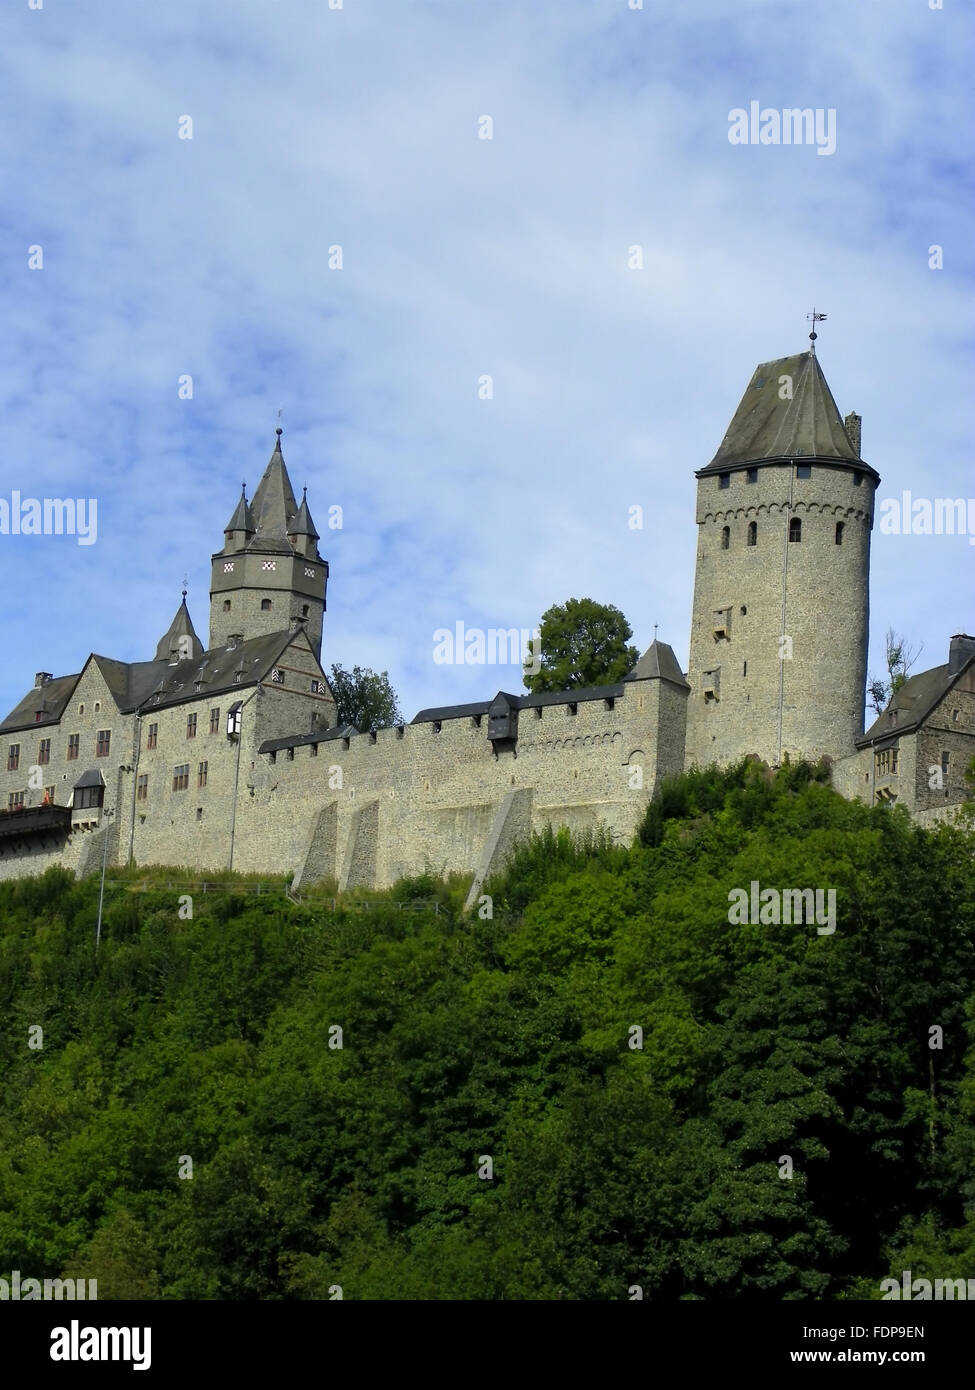 altena castle - Stock Image